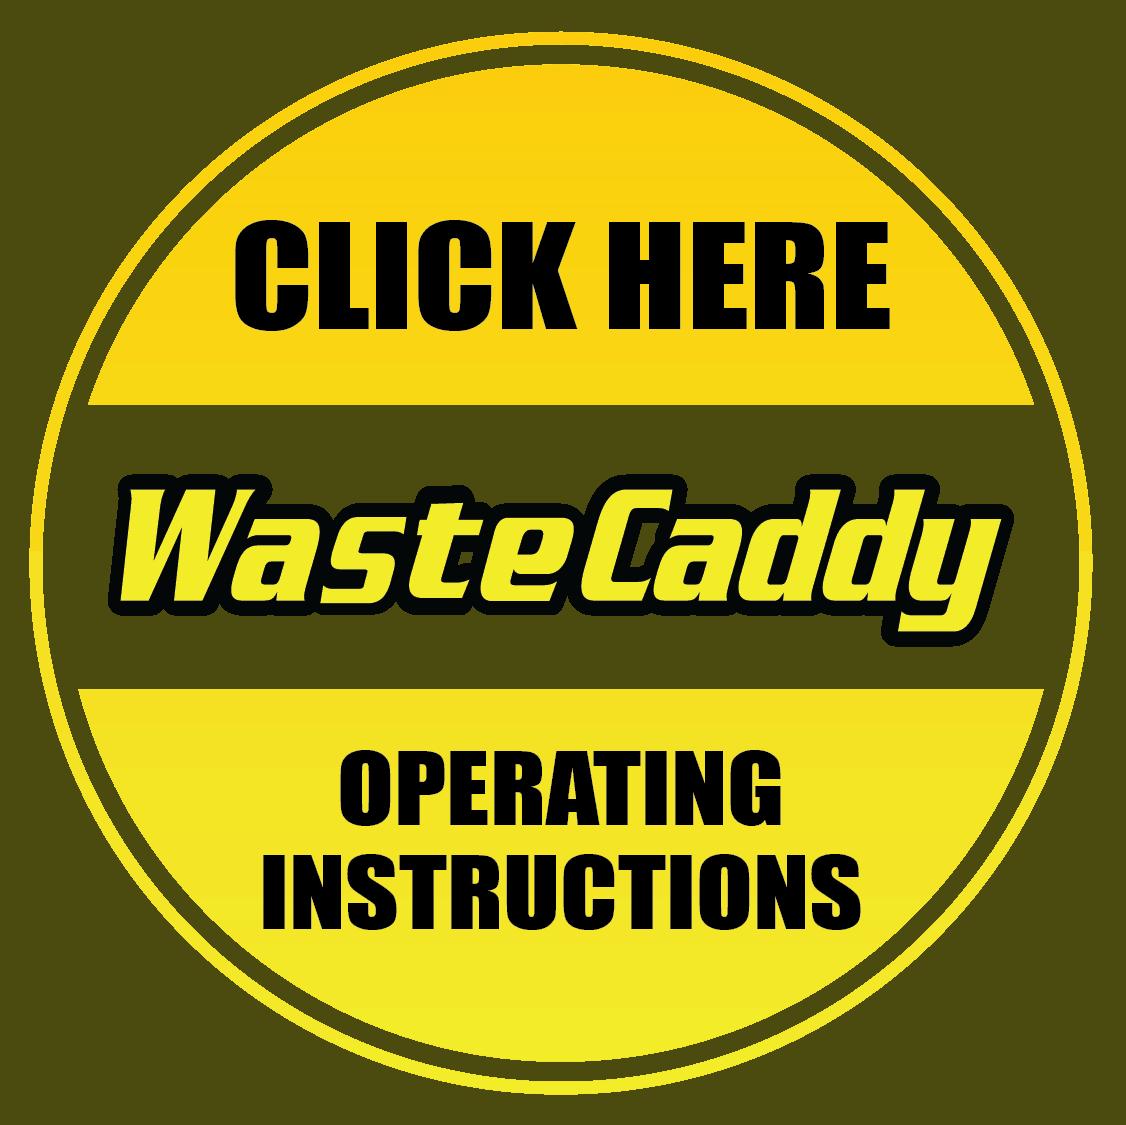 Wastecaddy Support